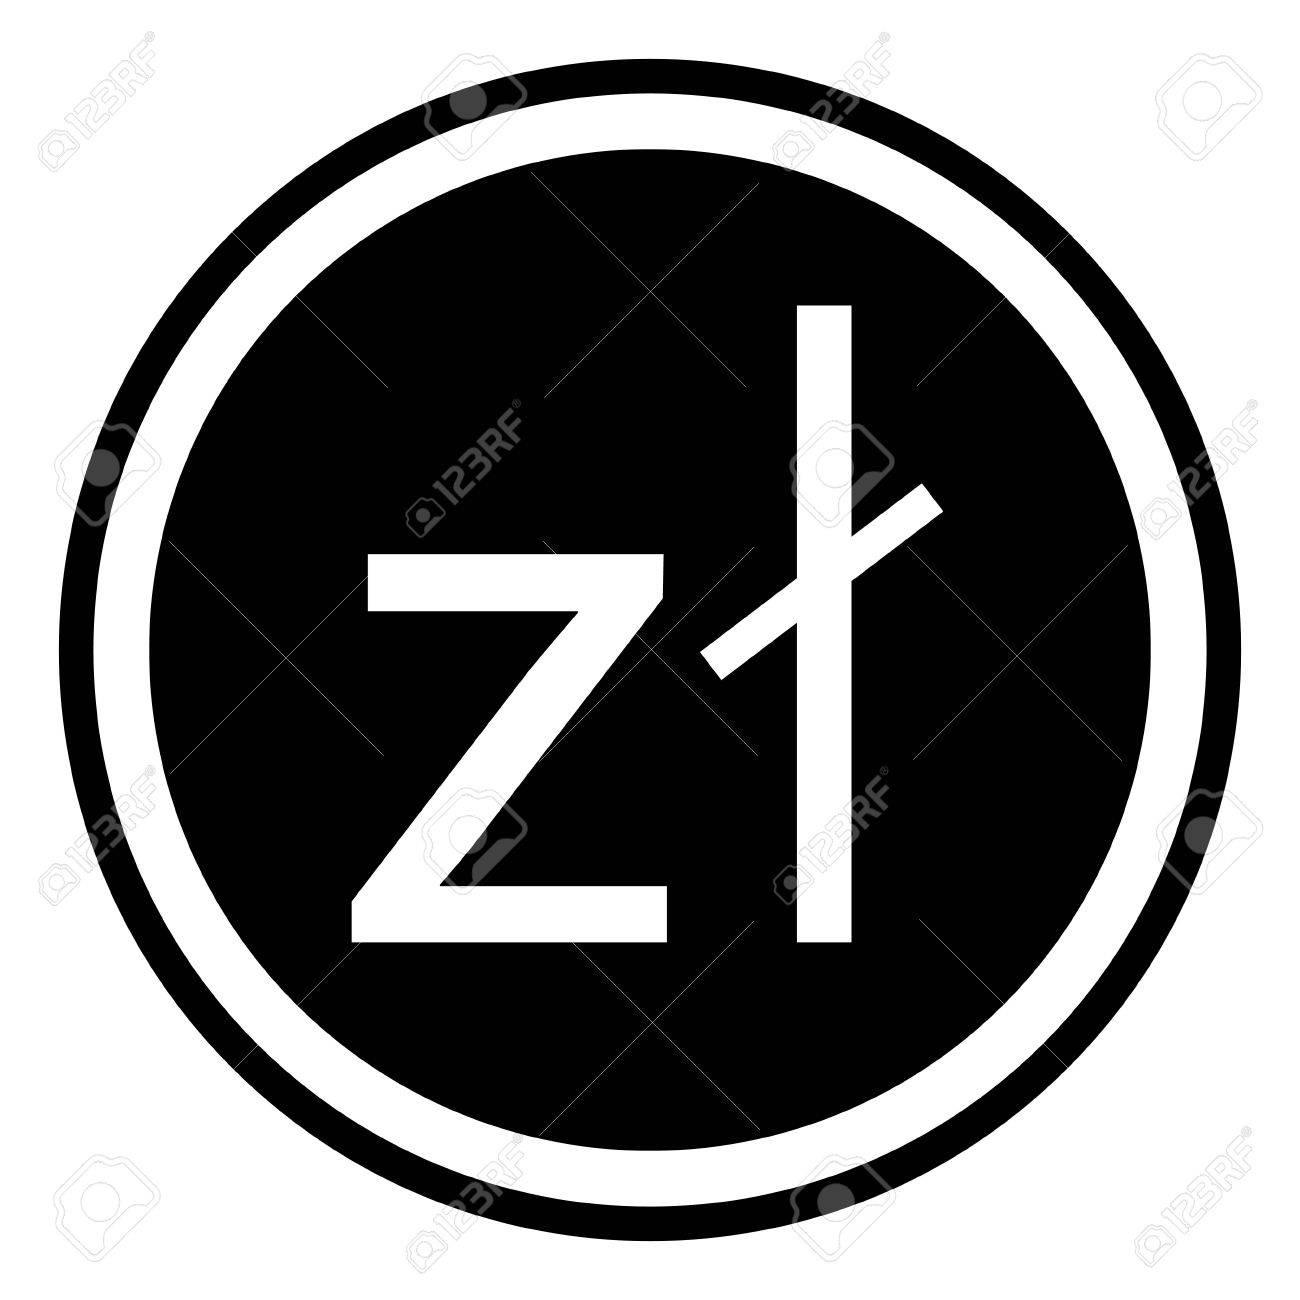 Sign Currency Poland Zloty Polish Zloty Vector Royalty Free